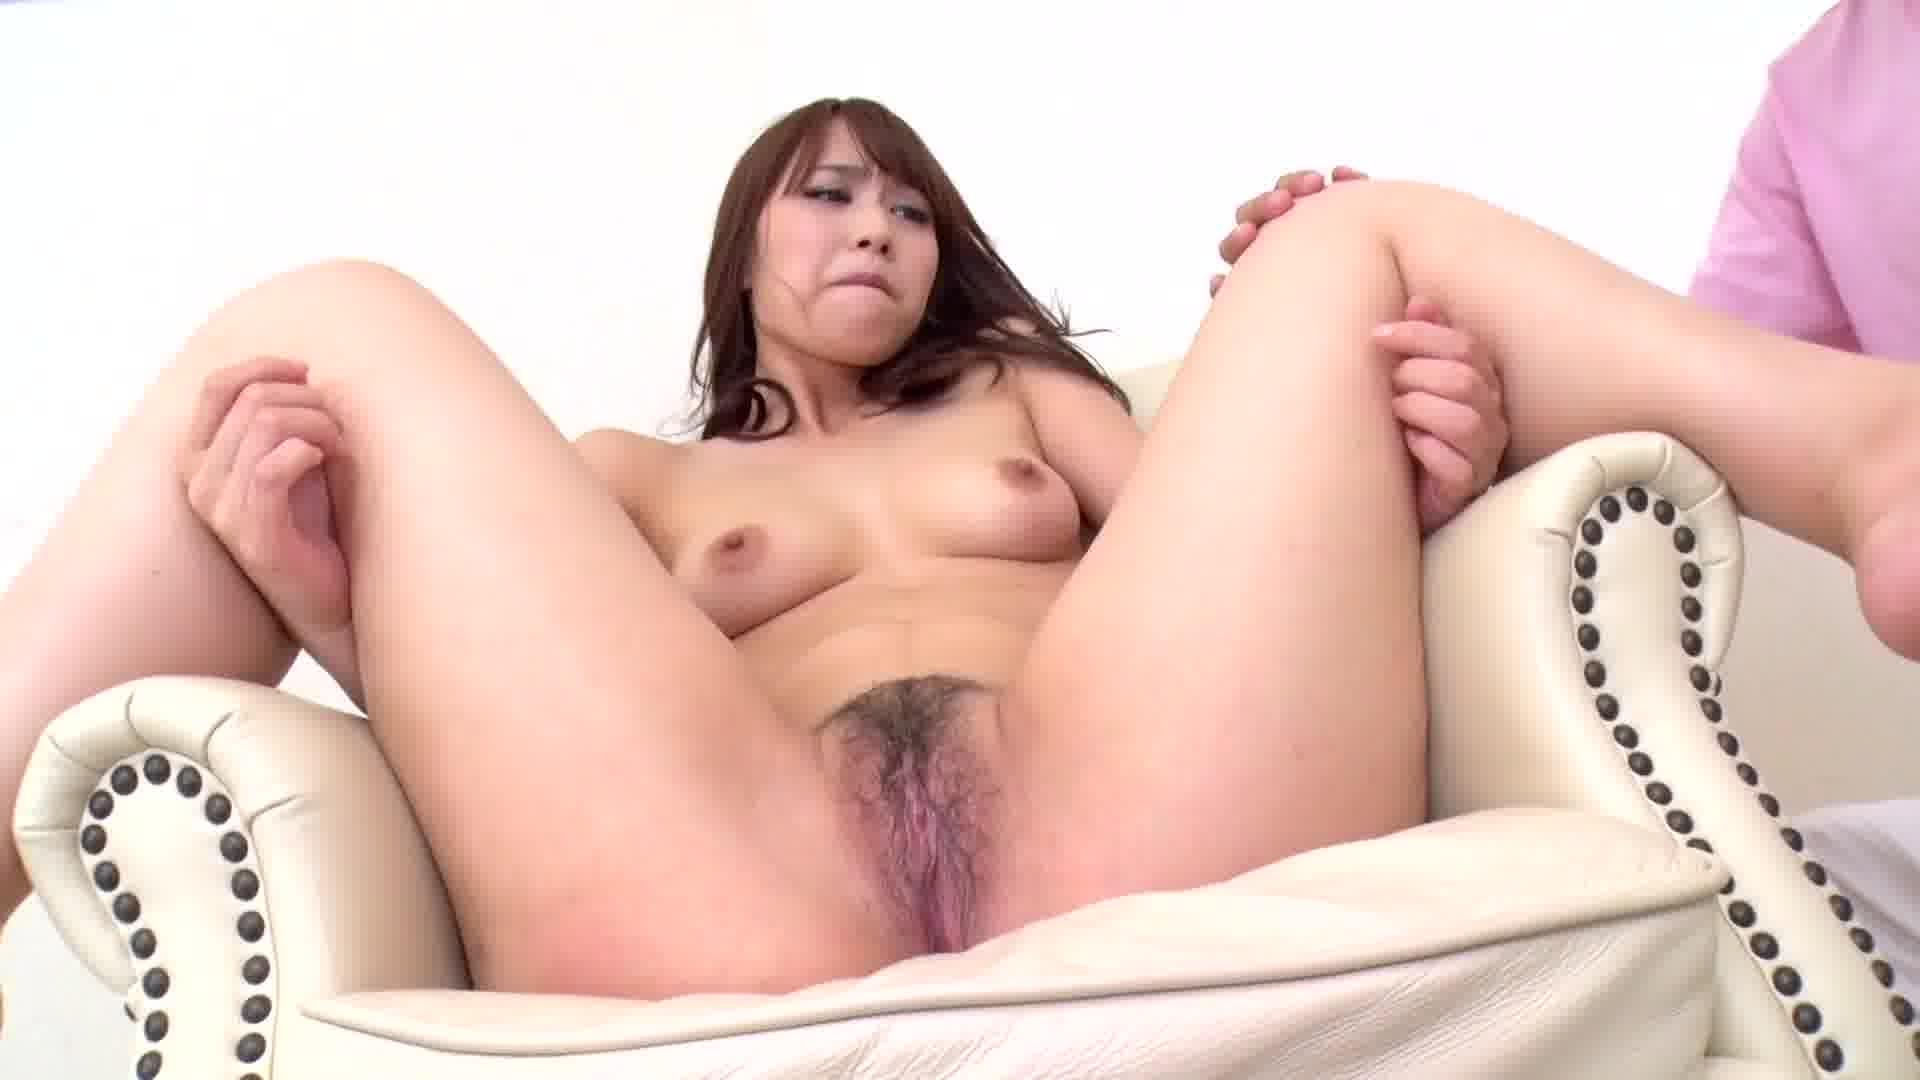 Debut Vol.46 ~可愛い微熟女!マンコは大喜び!~ - 速美もな【美乳・スレンダー・初裏】